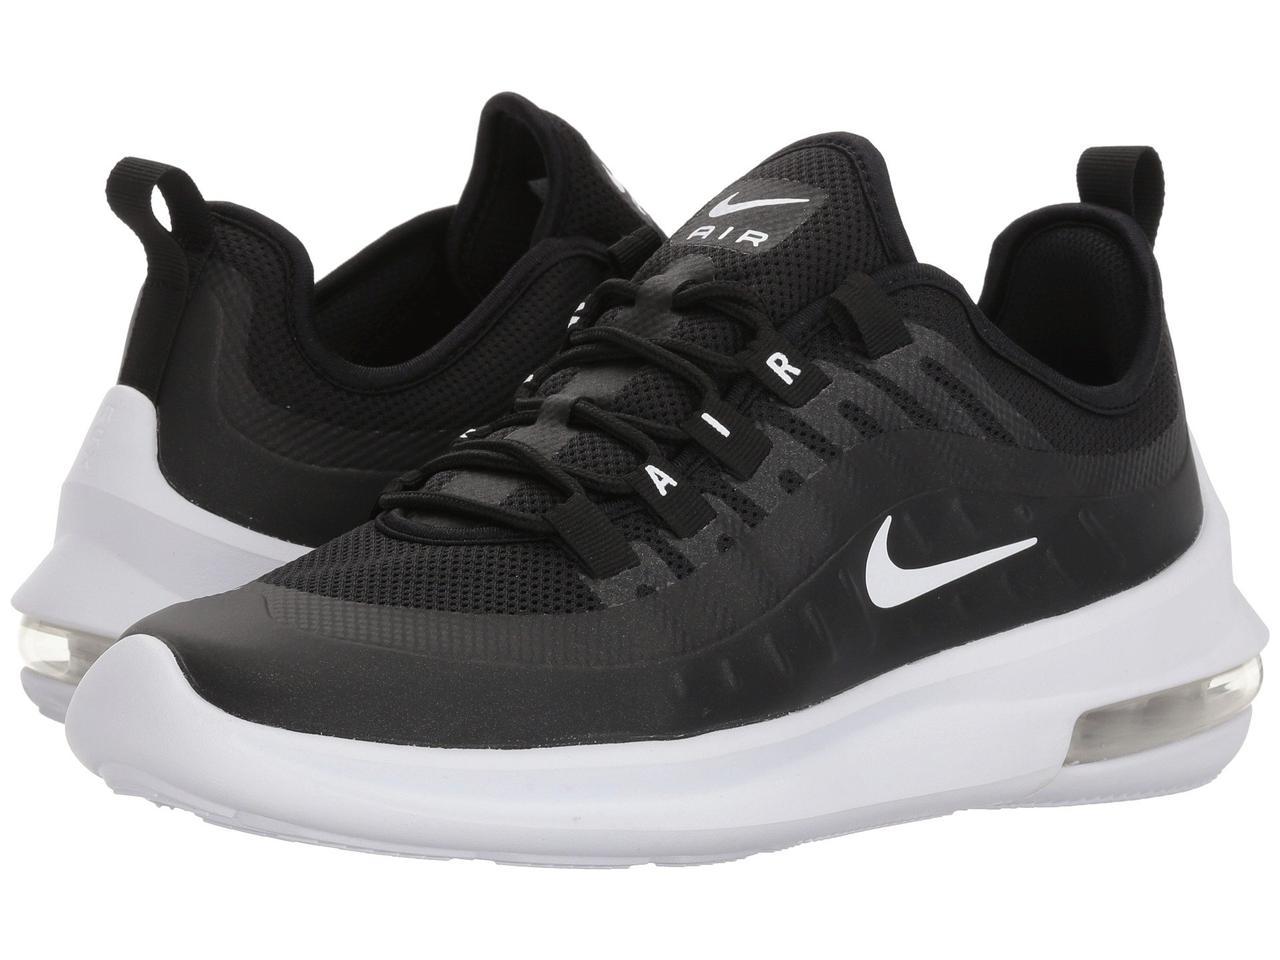 57bf65b5 Кроссовки/Кеды (Оригинал) Nike Air Max Axis Black/White: продажа ...